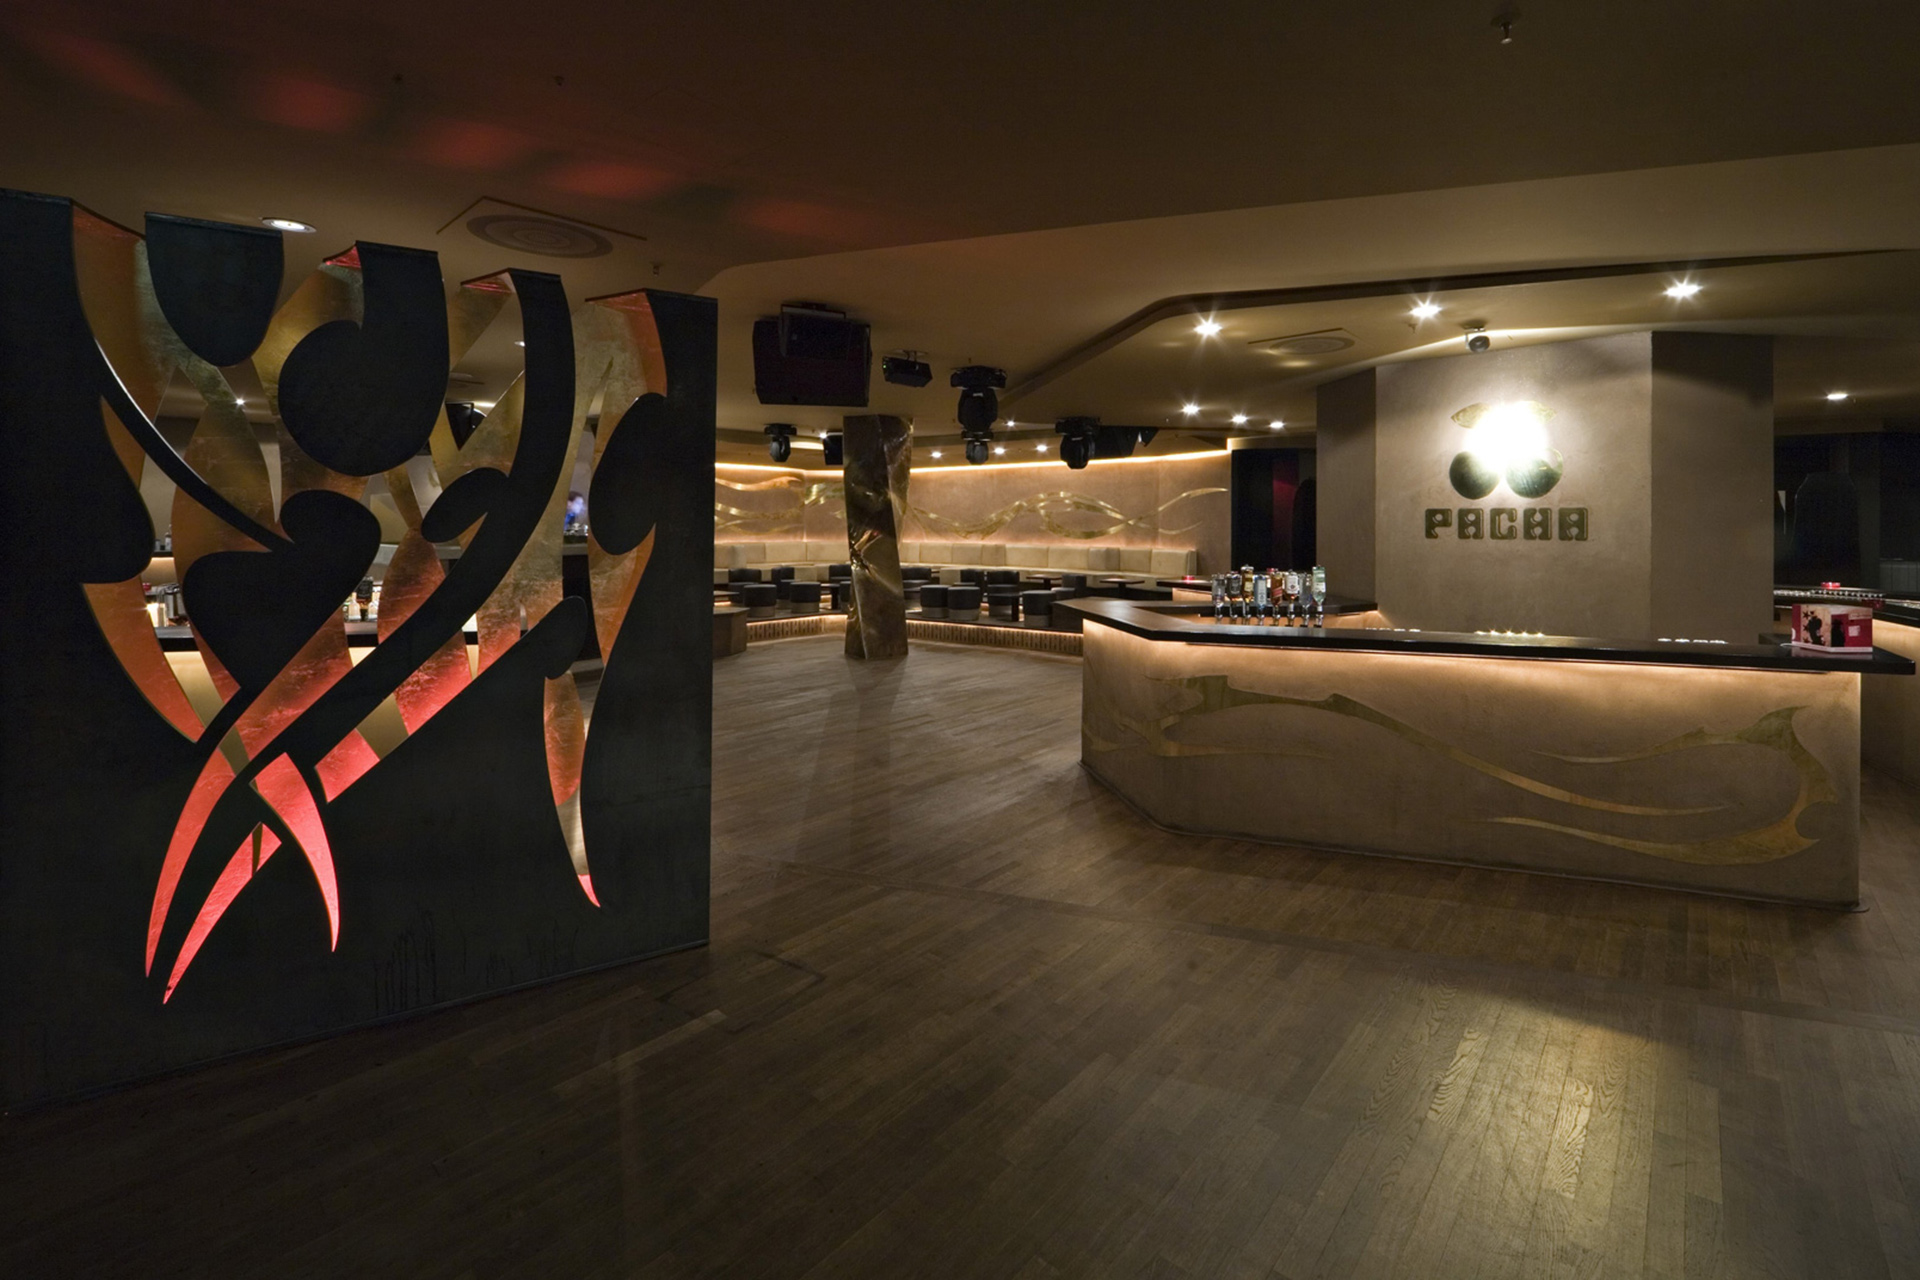 003-interior-design-hospitality-night-club-bar-pacha-muenchen-buero-philipp-moeller.jpg